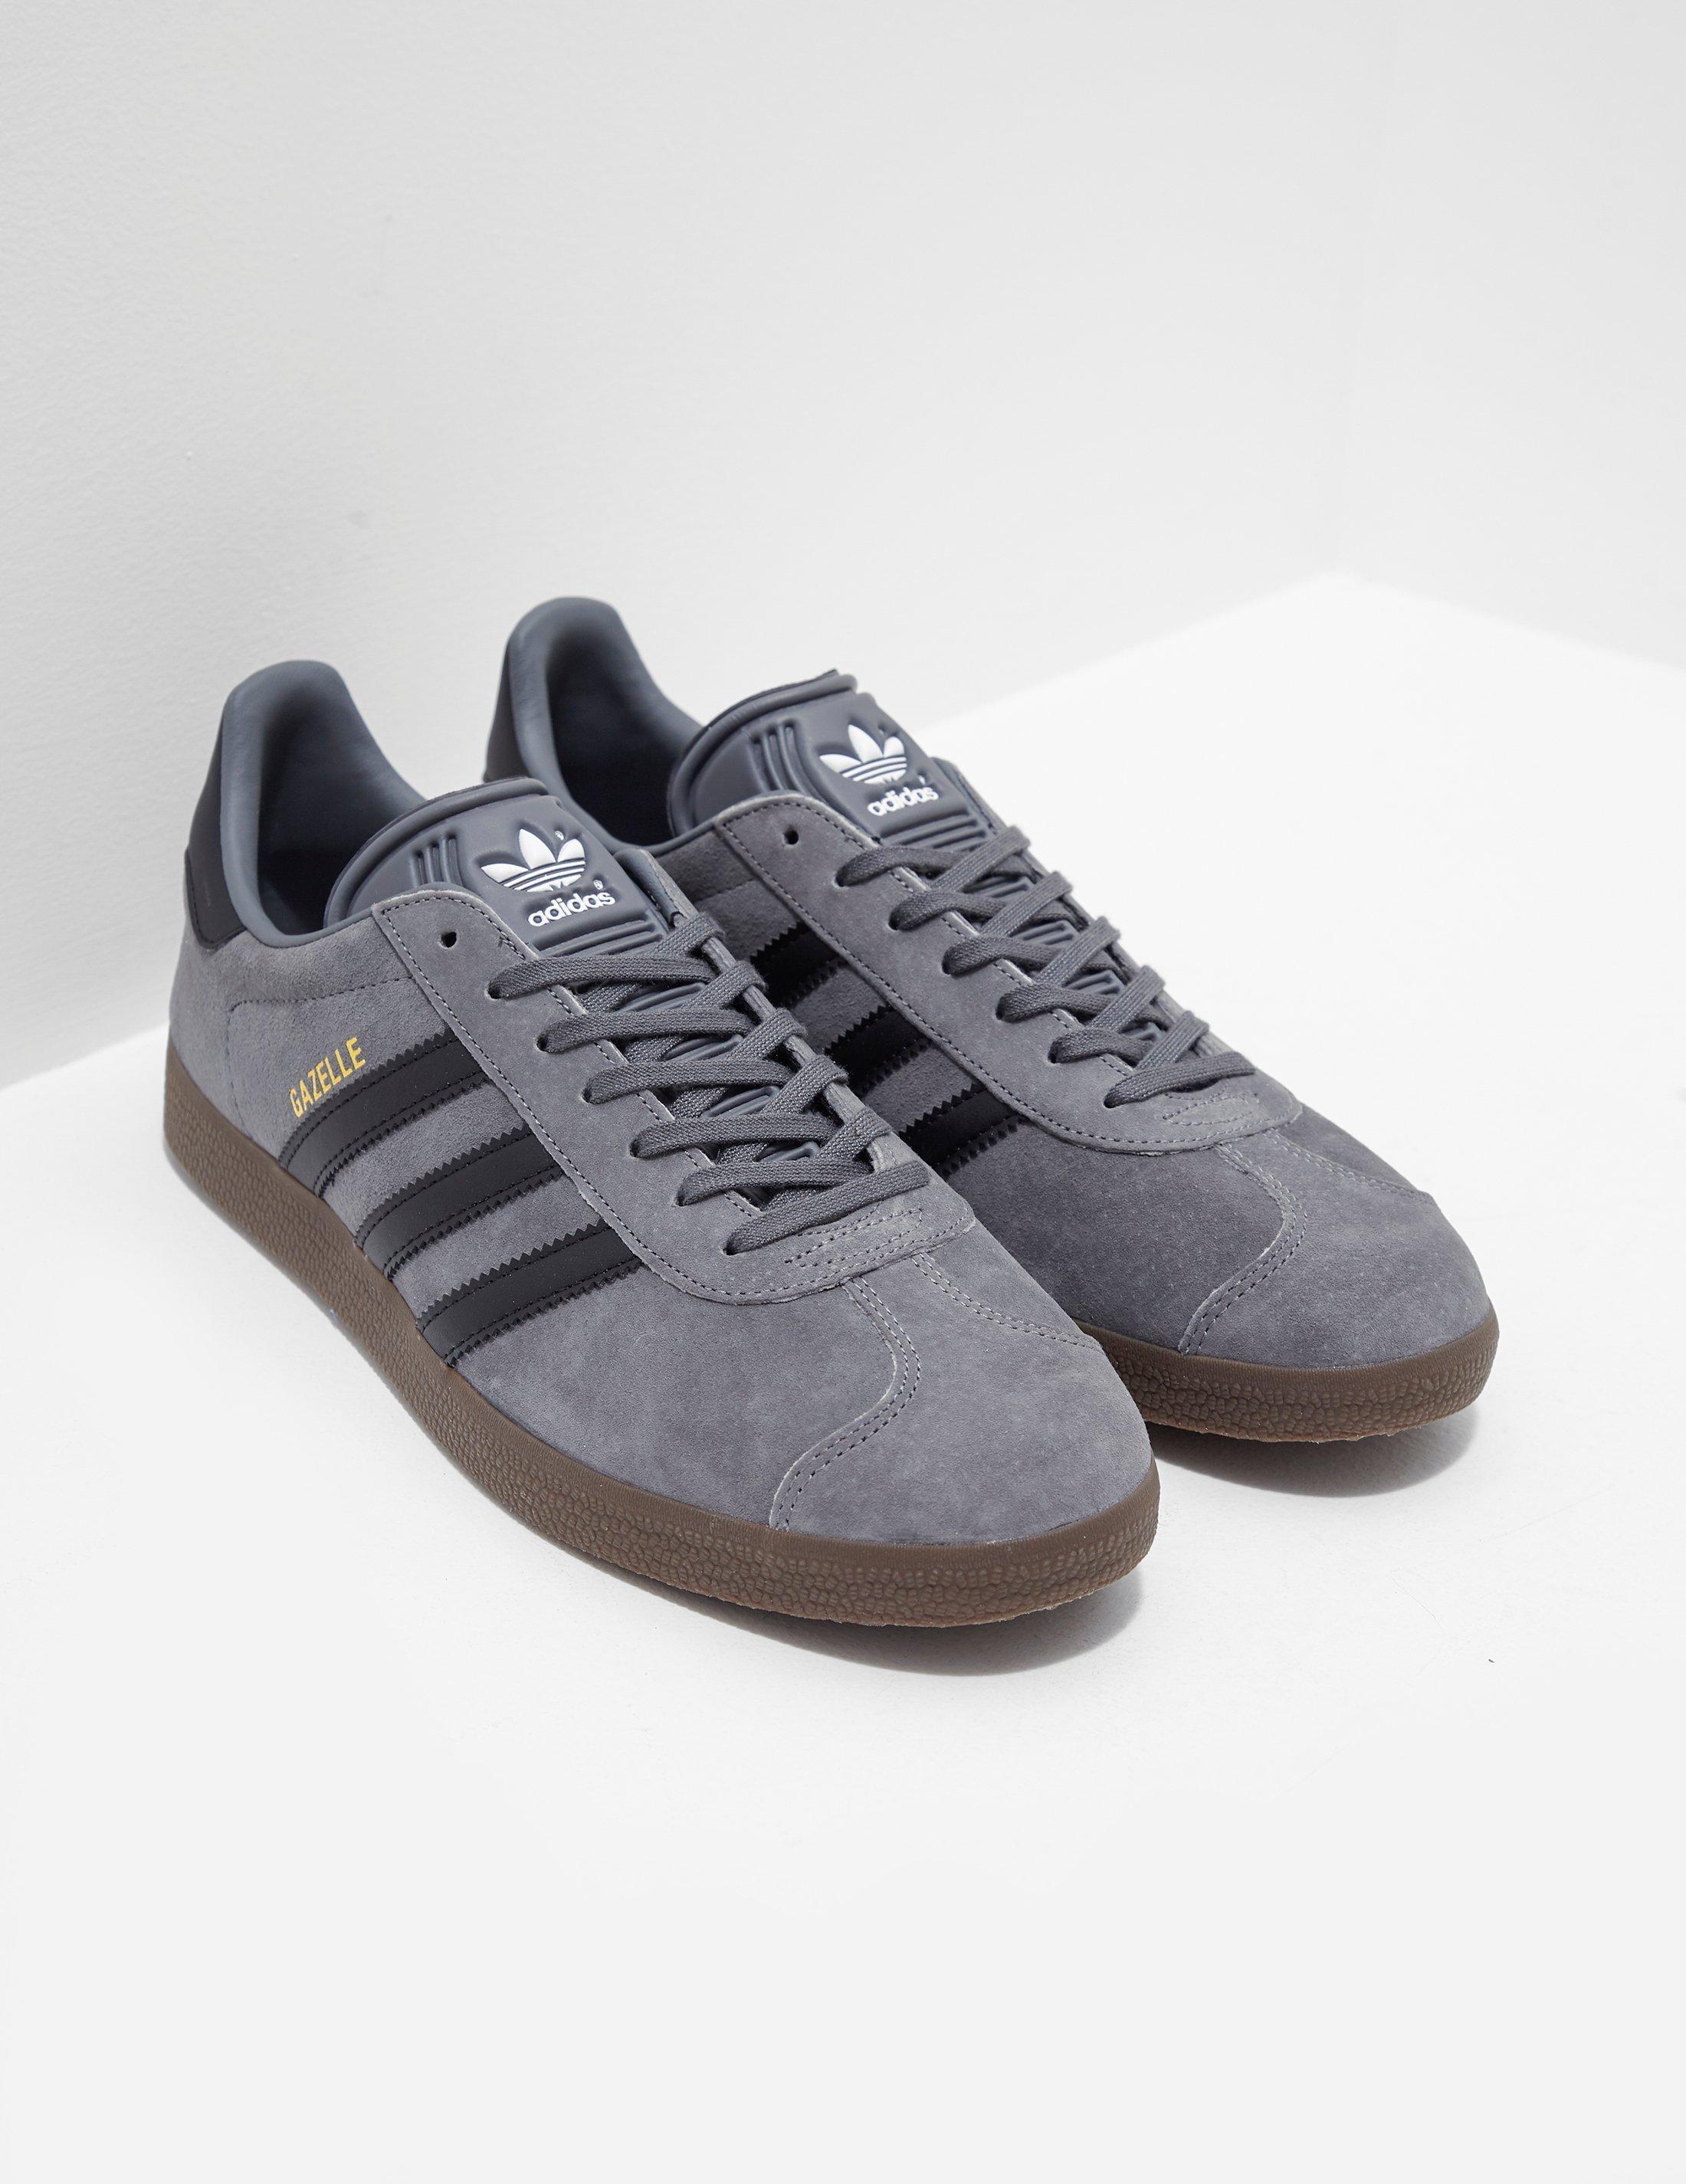 adidas Originals Gazelle Grey in Gray for Men - Lyst a734d6d8d